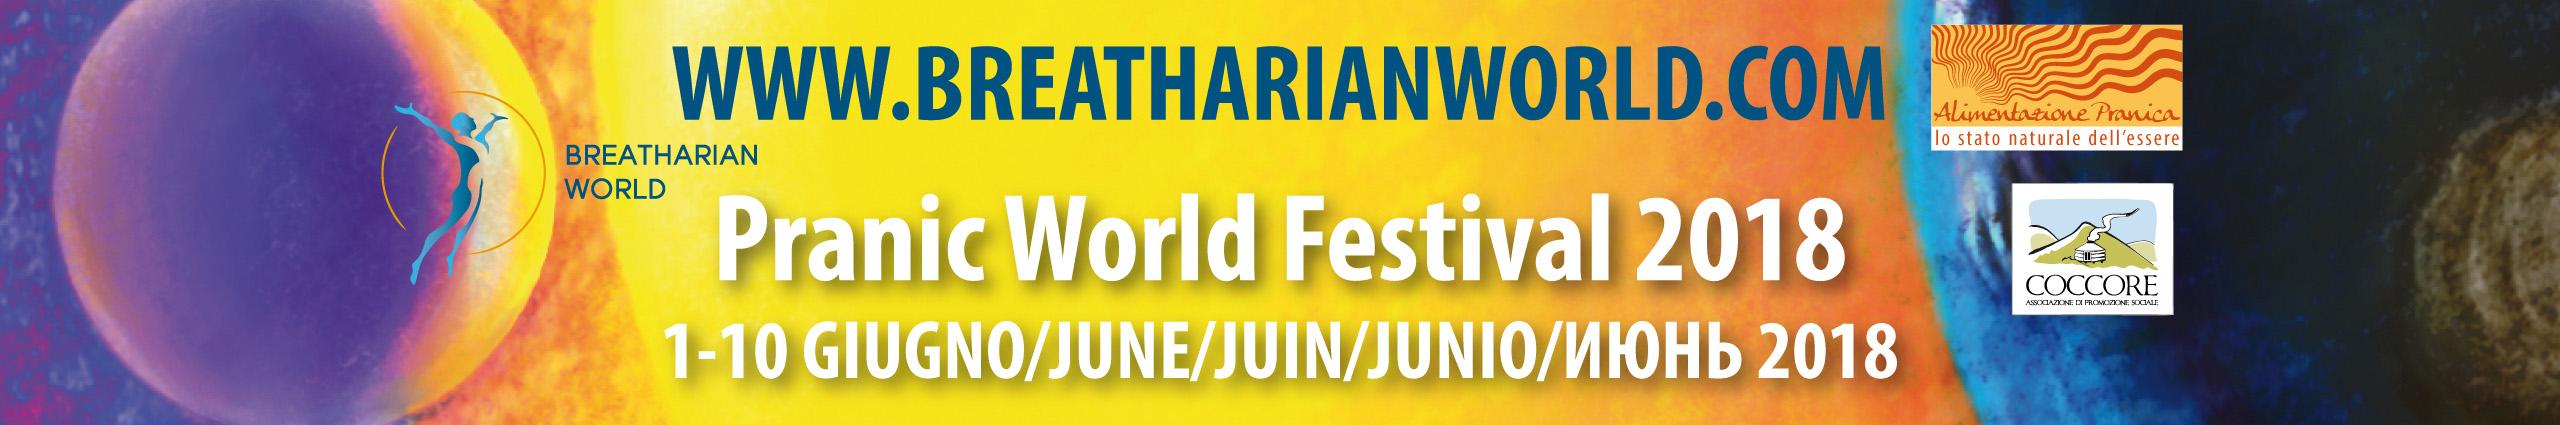 Pranic World Festival 2018